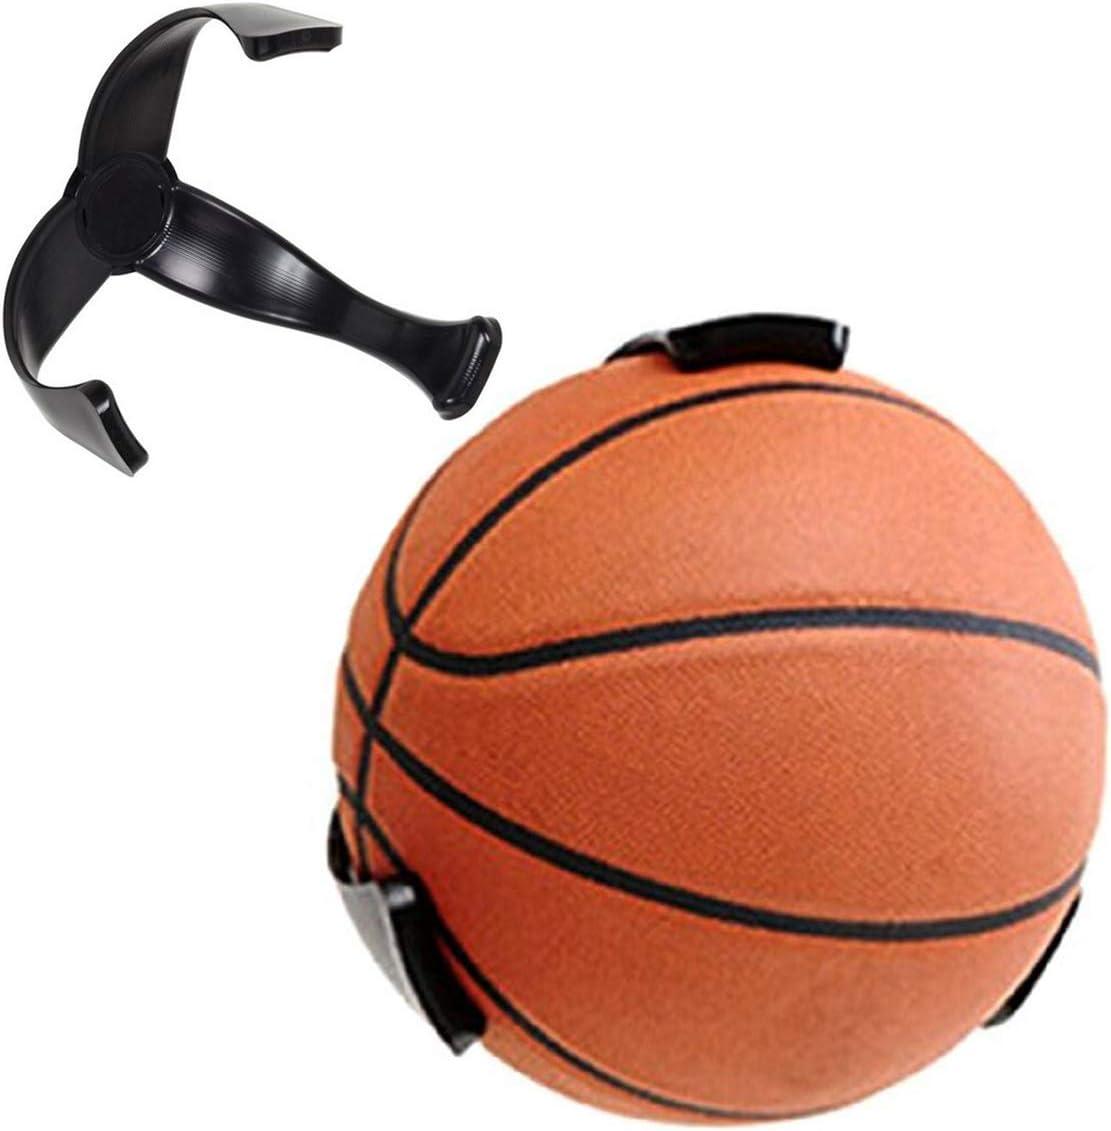 1*Basketball Ball Claw Wall Mount Display Holder Organizer Storage Rack Best UK*